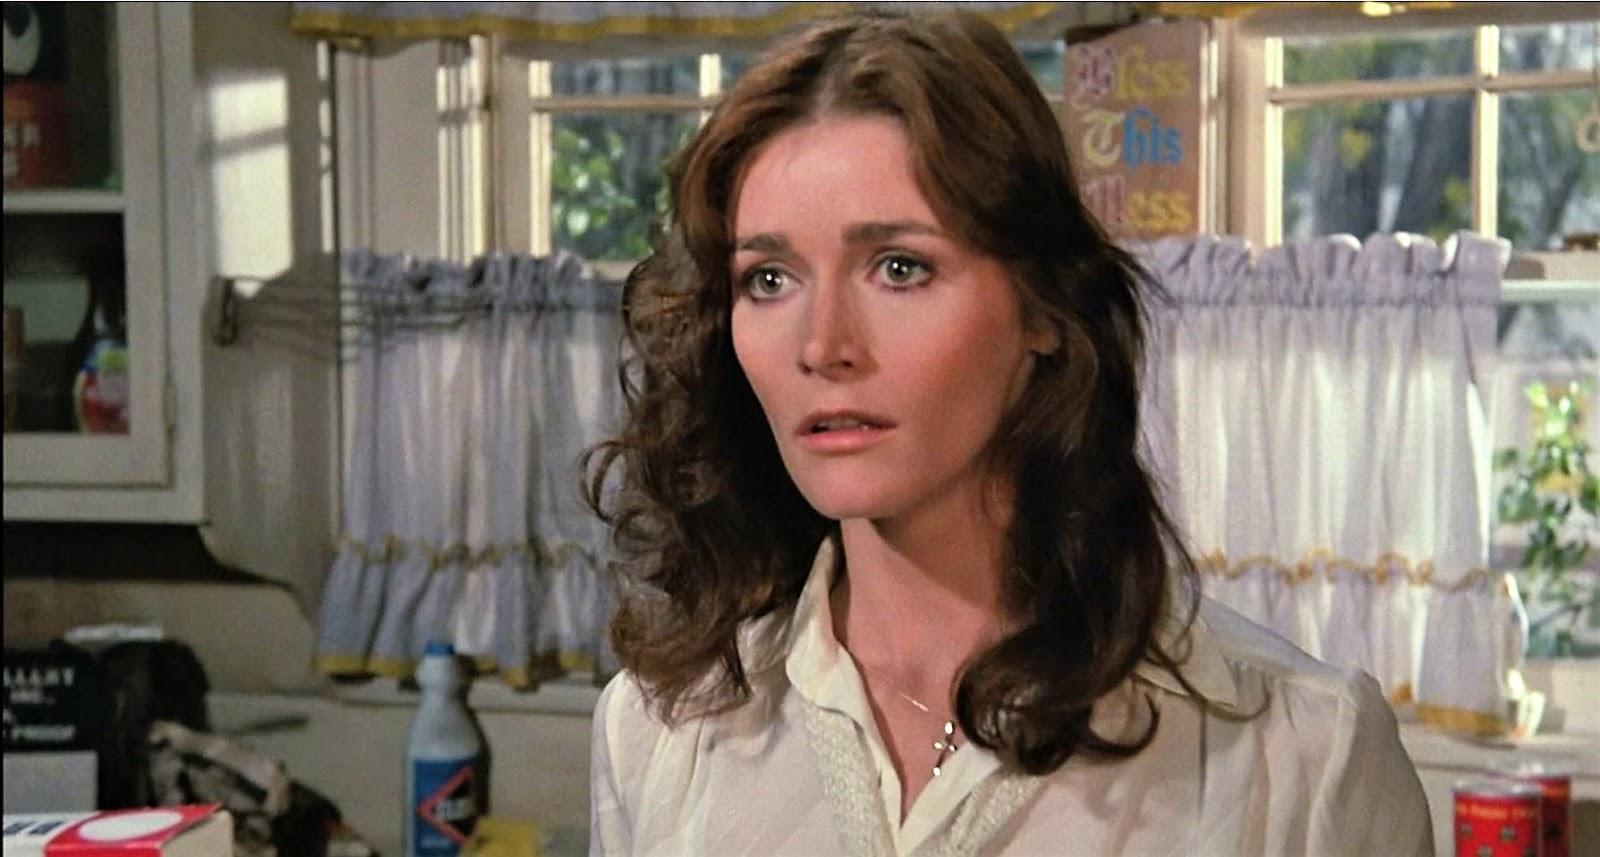 Margot-Kidder-Amityville-Horror-1979.JPG